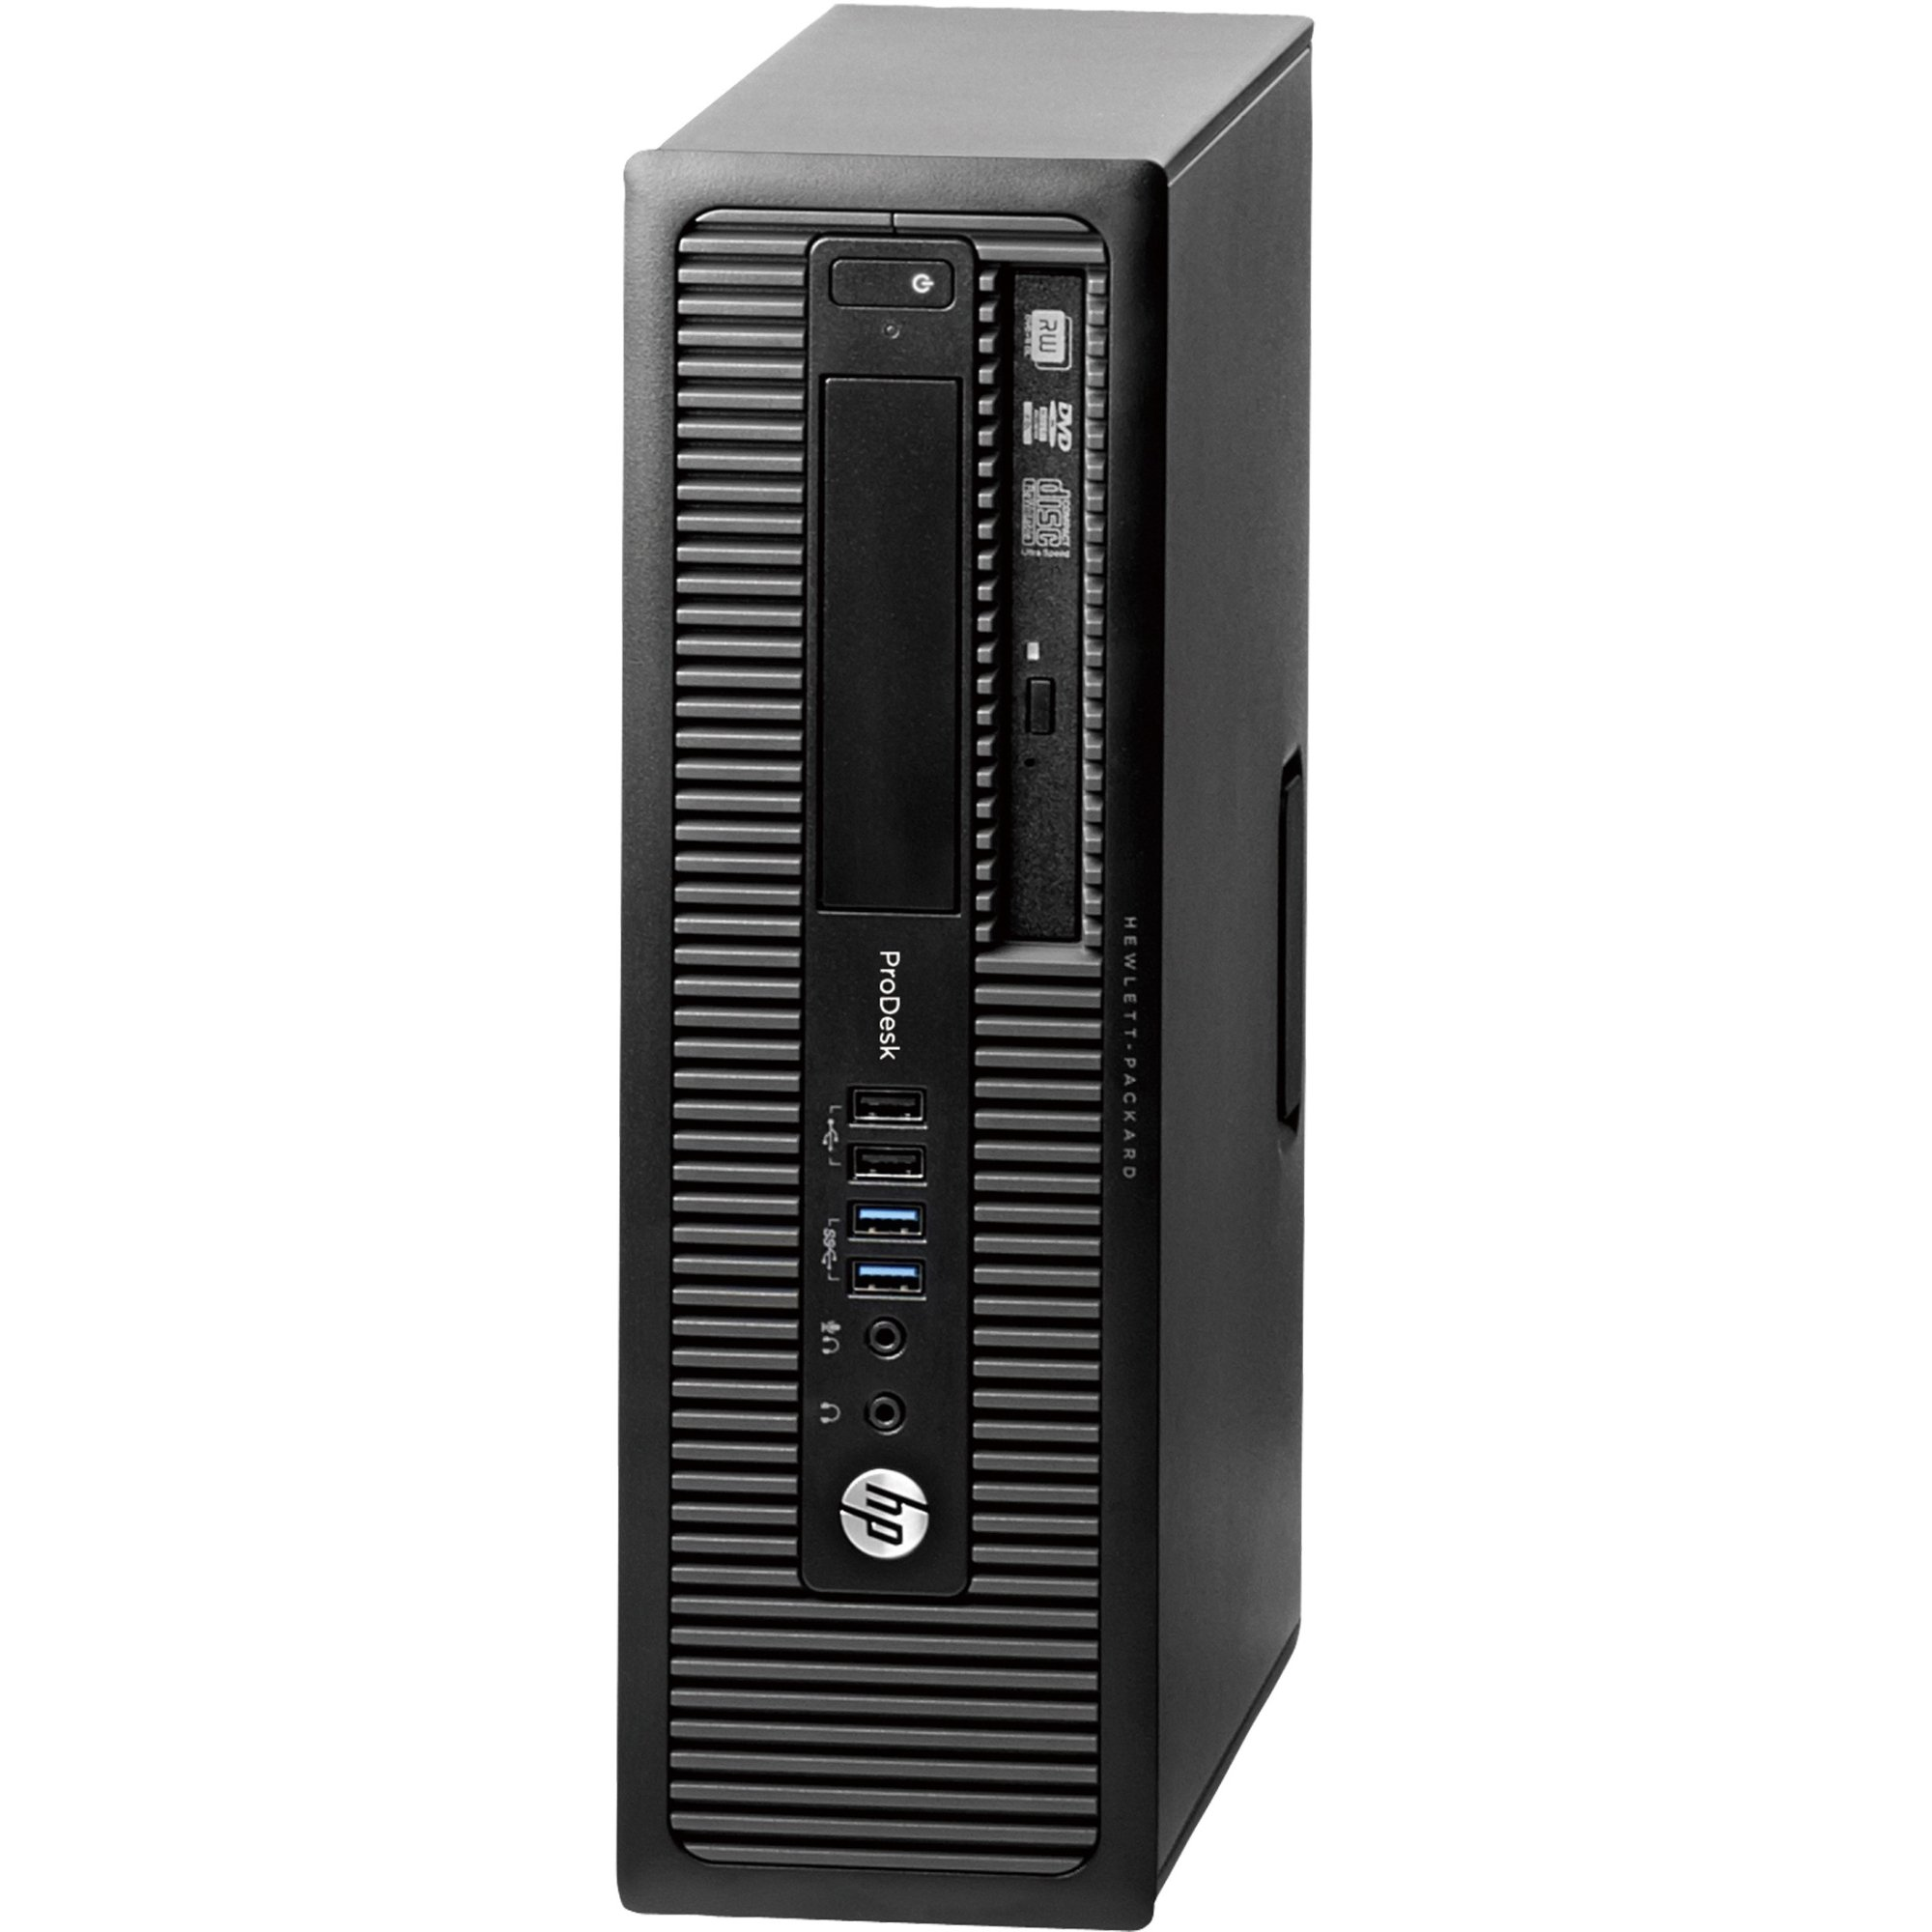 HP Business Desktop ProDesk 600 G1 Desktop Computer - Intel Core i5 i5-4590 3.30 GHz - Small Form Factor